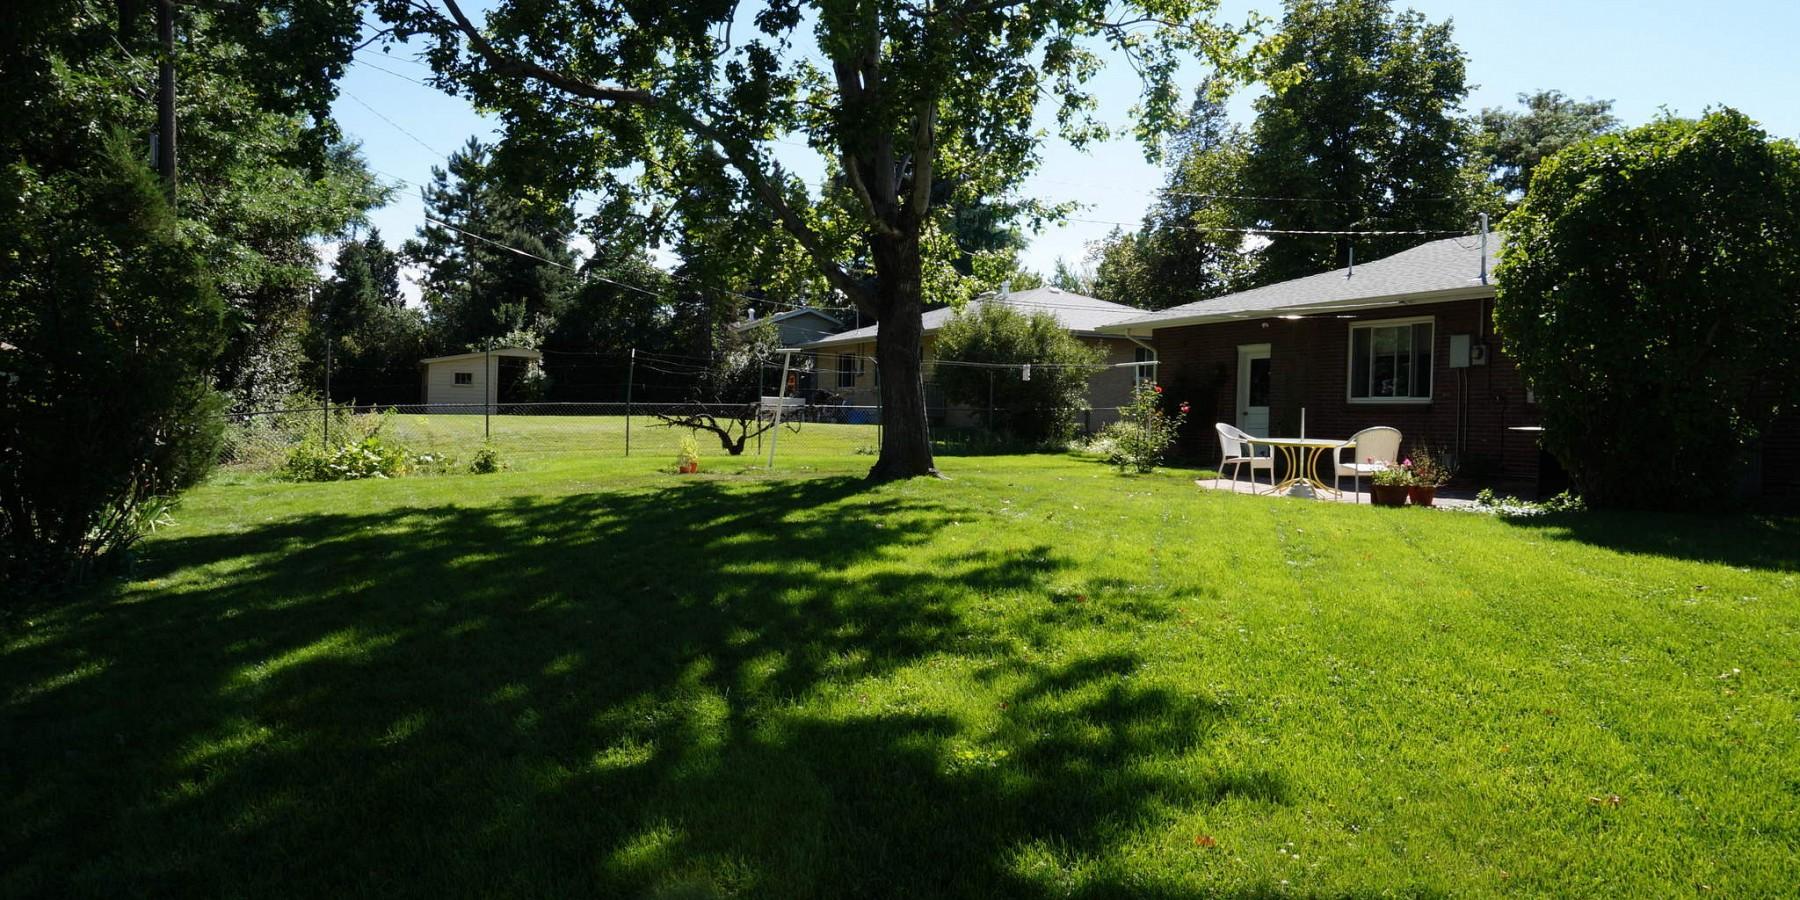 40 South Everett Street, Lakewood, CO 80226